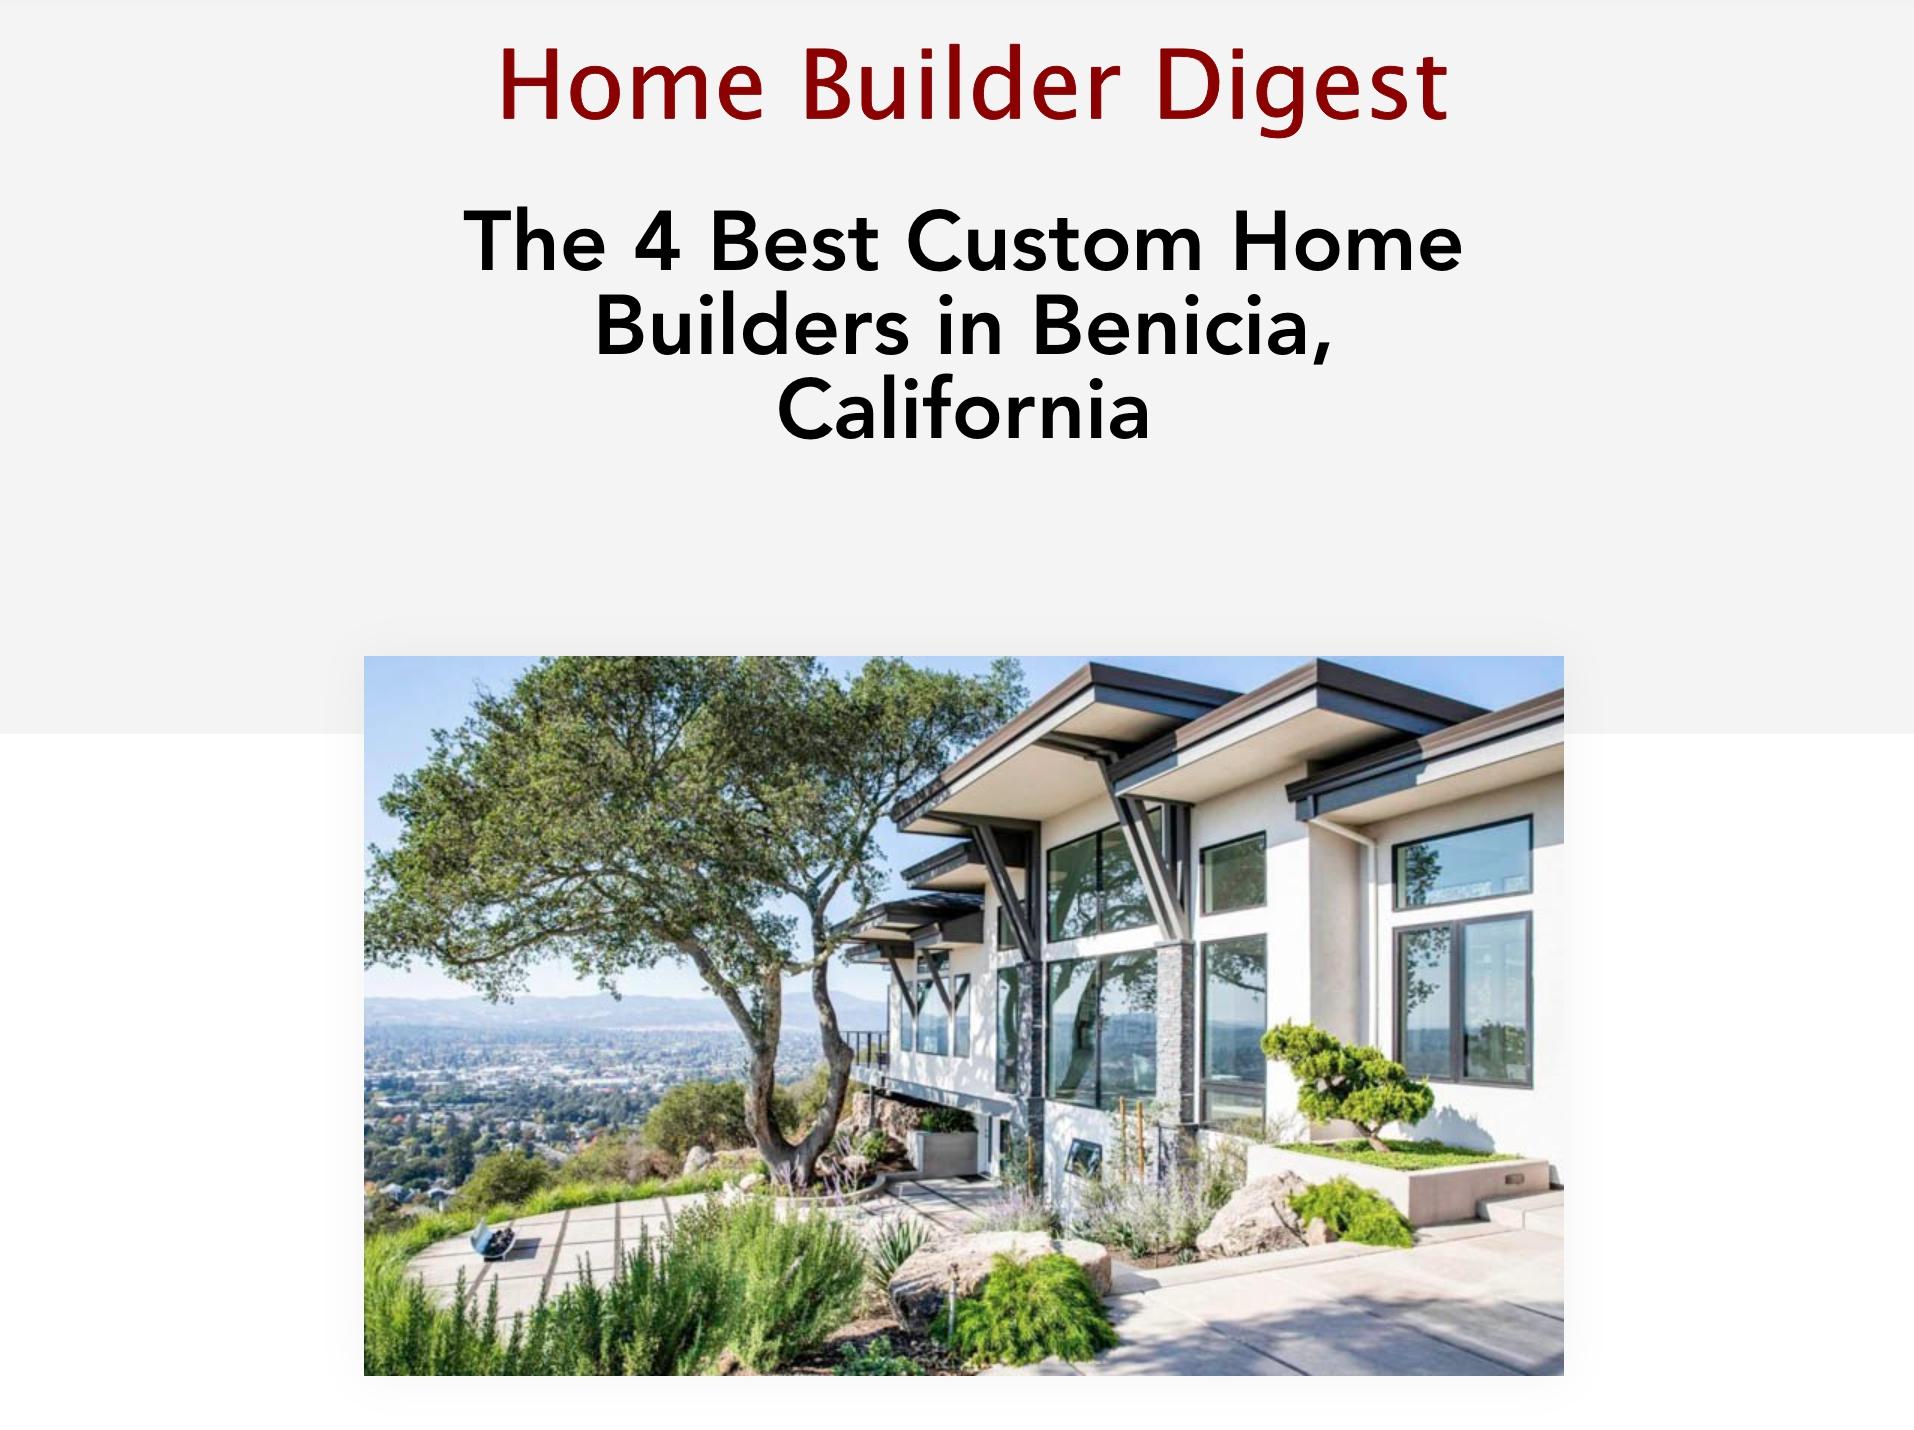 CRC Builders Home Builder Digest